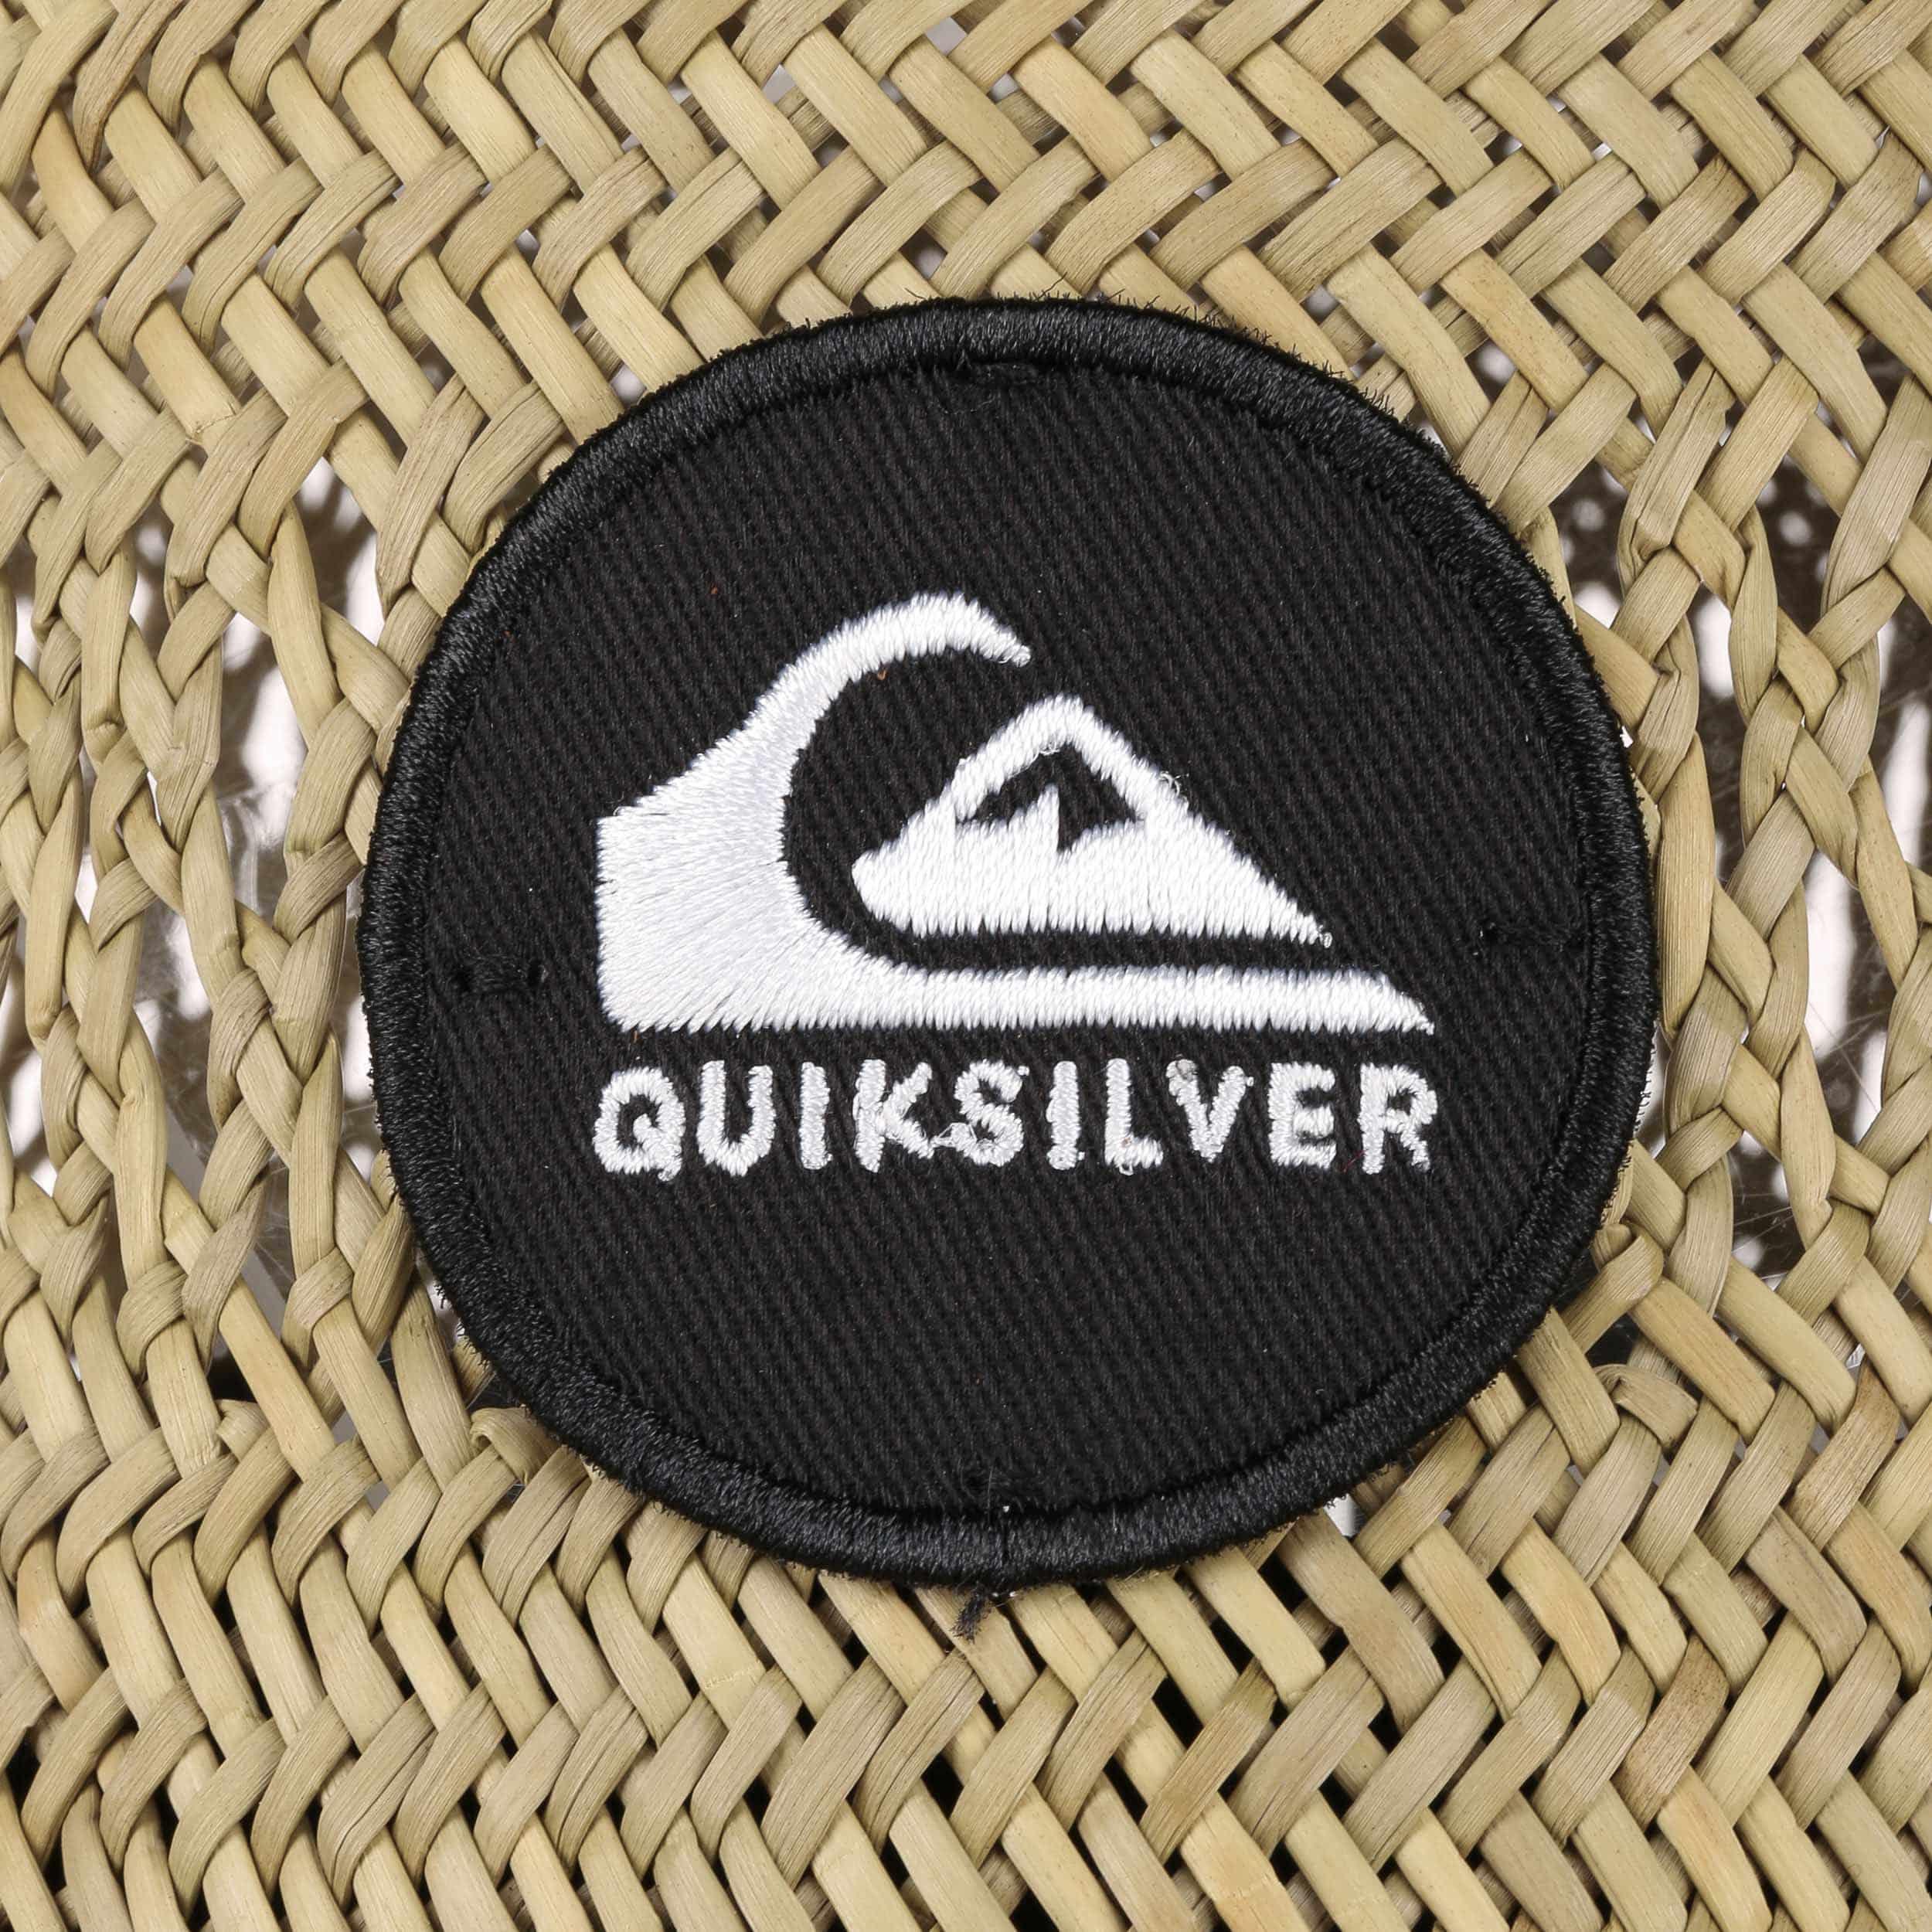 ... Sombrero de Paja Lifeguard Pierside by Quiksilver - natural 3 ... 639321926df